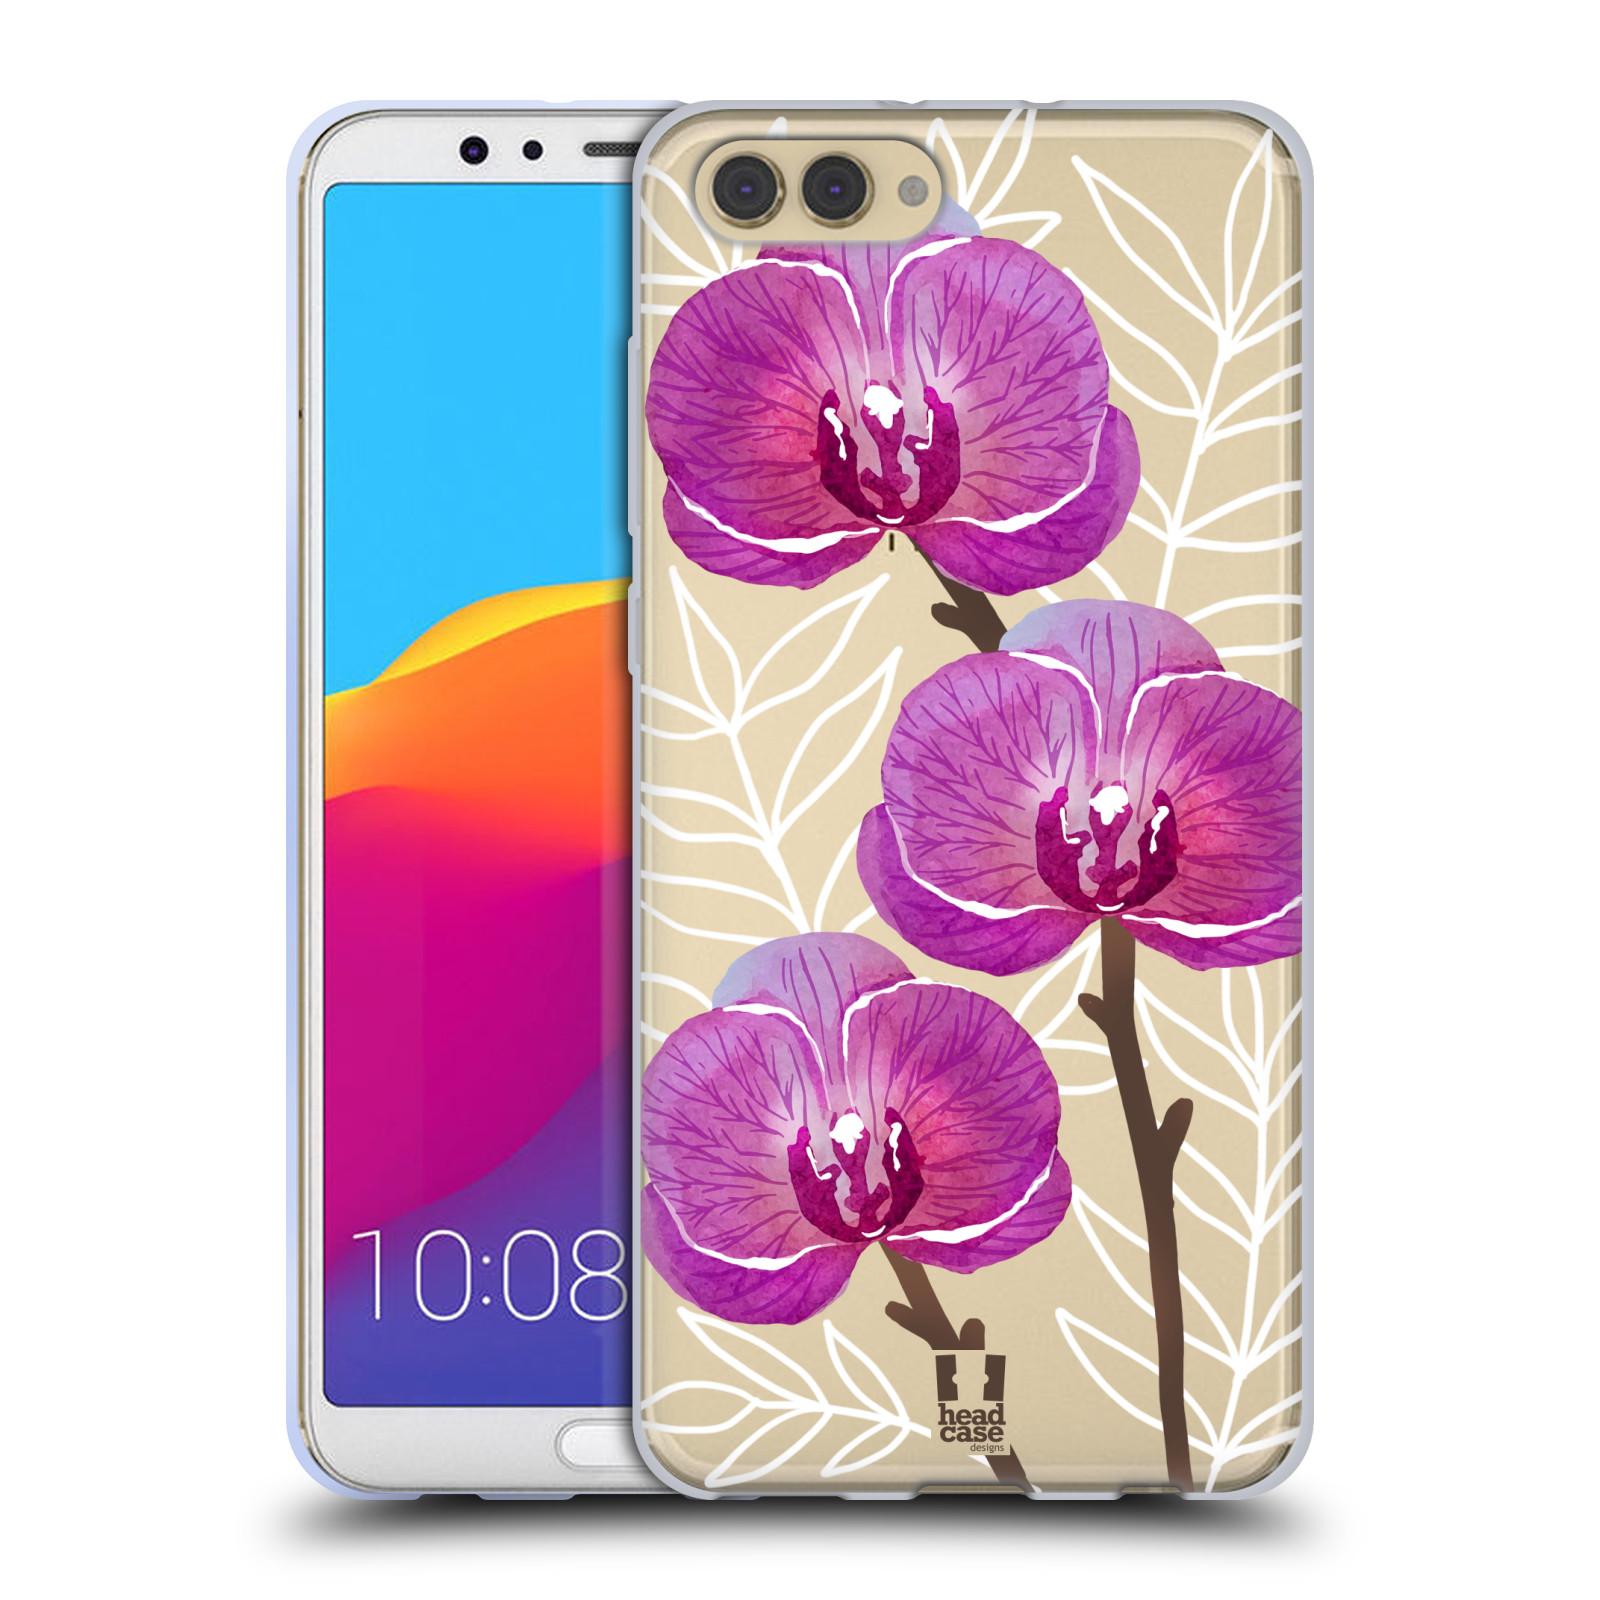 HEAD CASE silikonový obal na mobil Huawei HONOR VIEW 10 / V10 Orchideje fialová